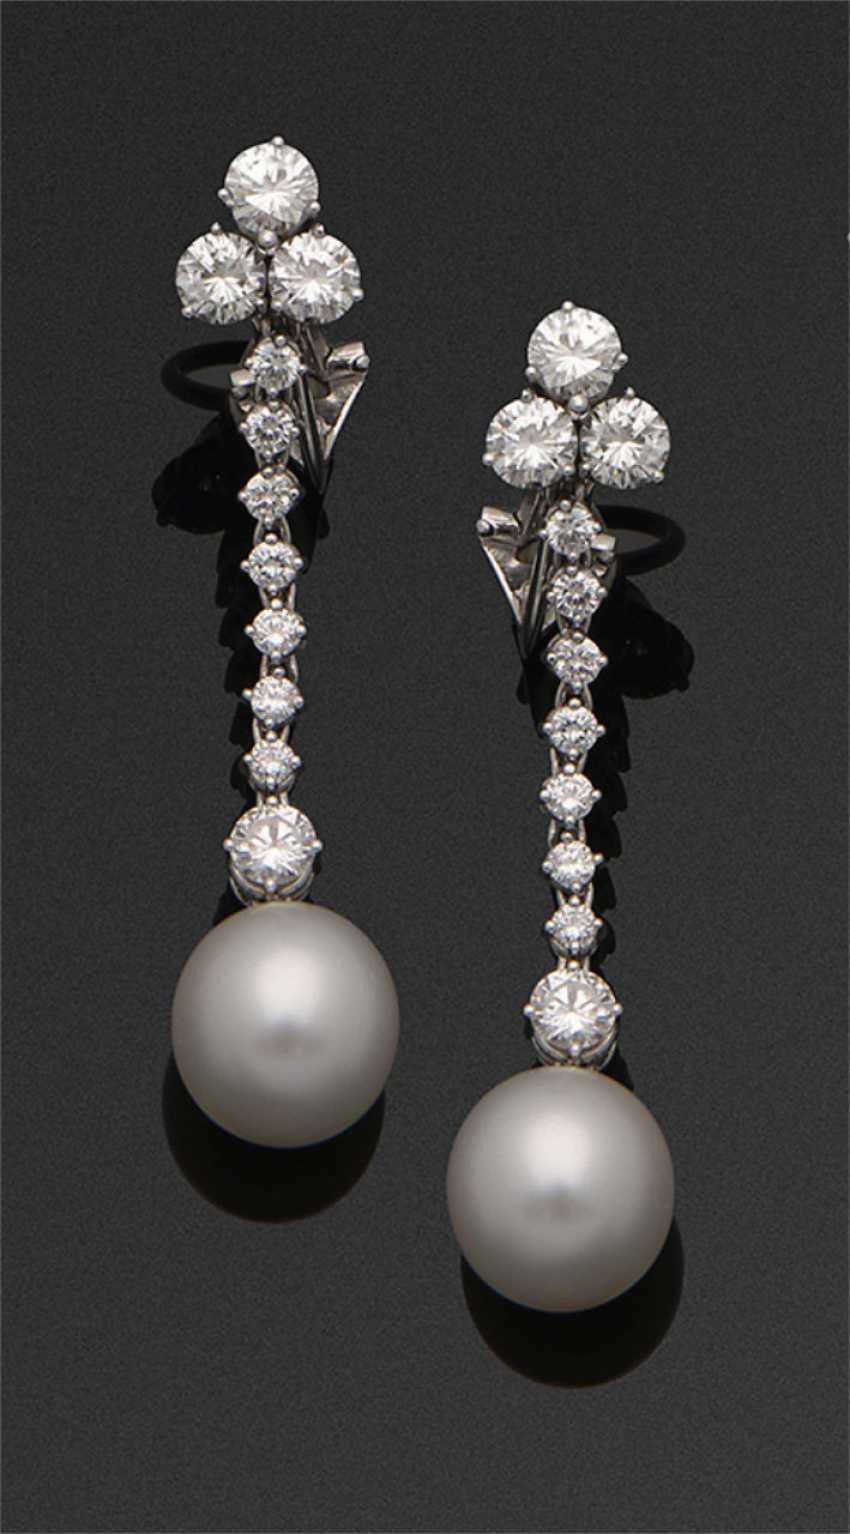 Pair of very fine diamond pearl earrings - photo 1